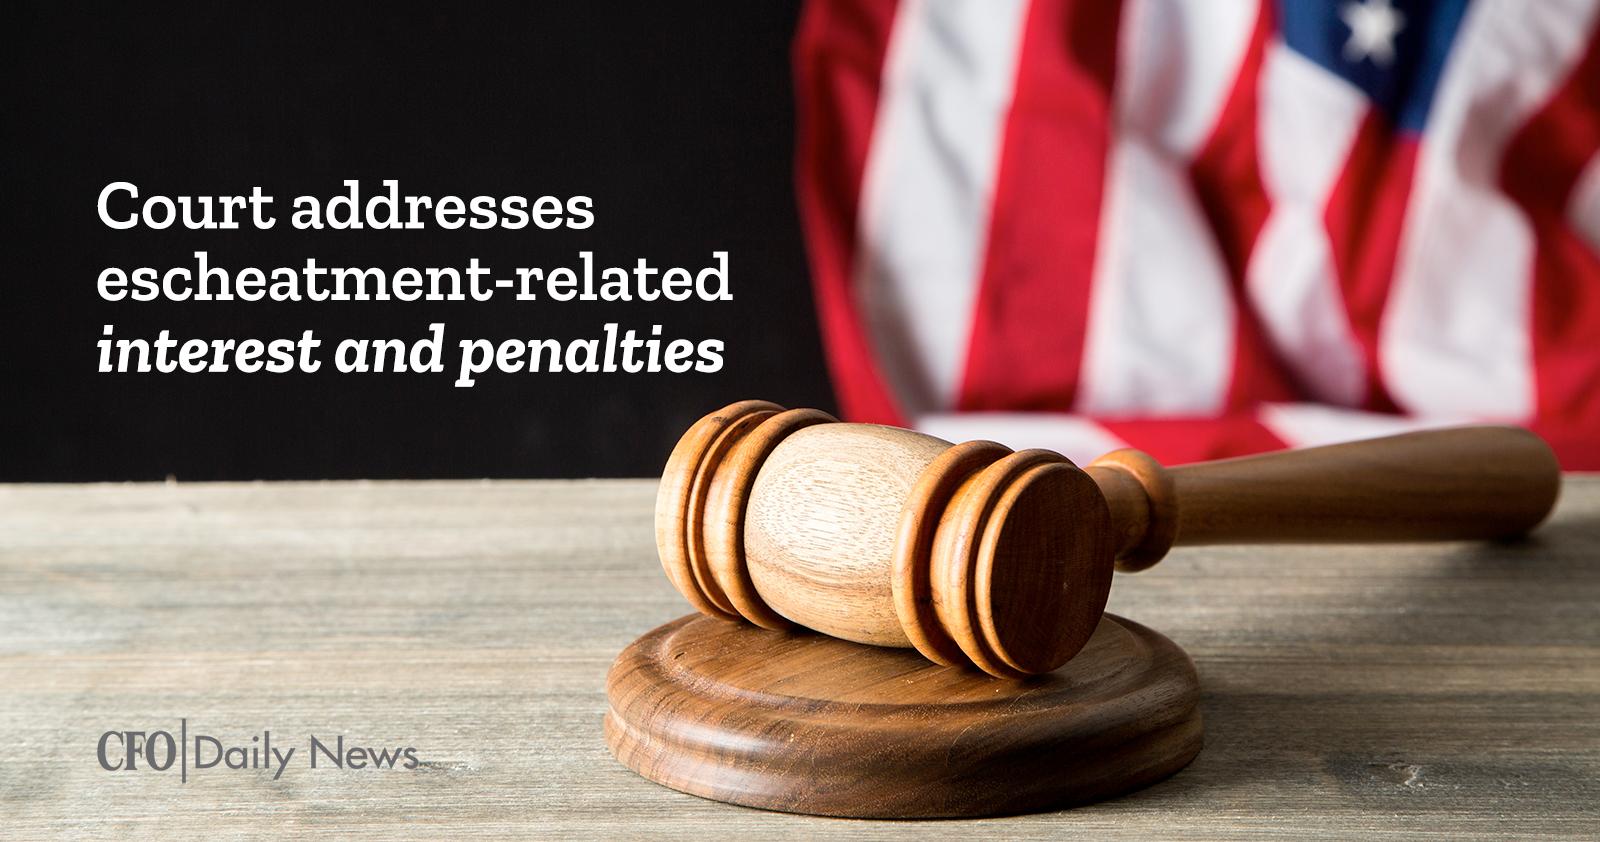 court addresses escheatment-related interest and penalties